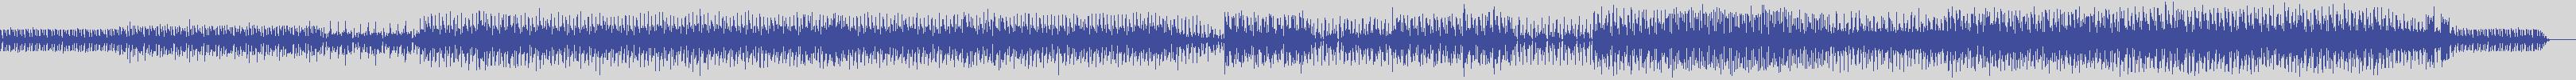 just_digital_records [JS1065] Dj Alex Del Lago - After Mid Night [Dub Vrs] audio wave form